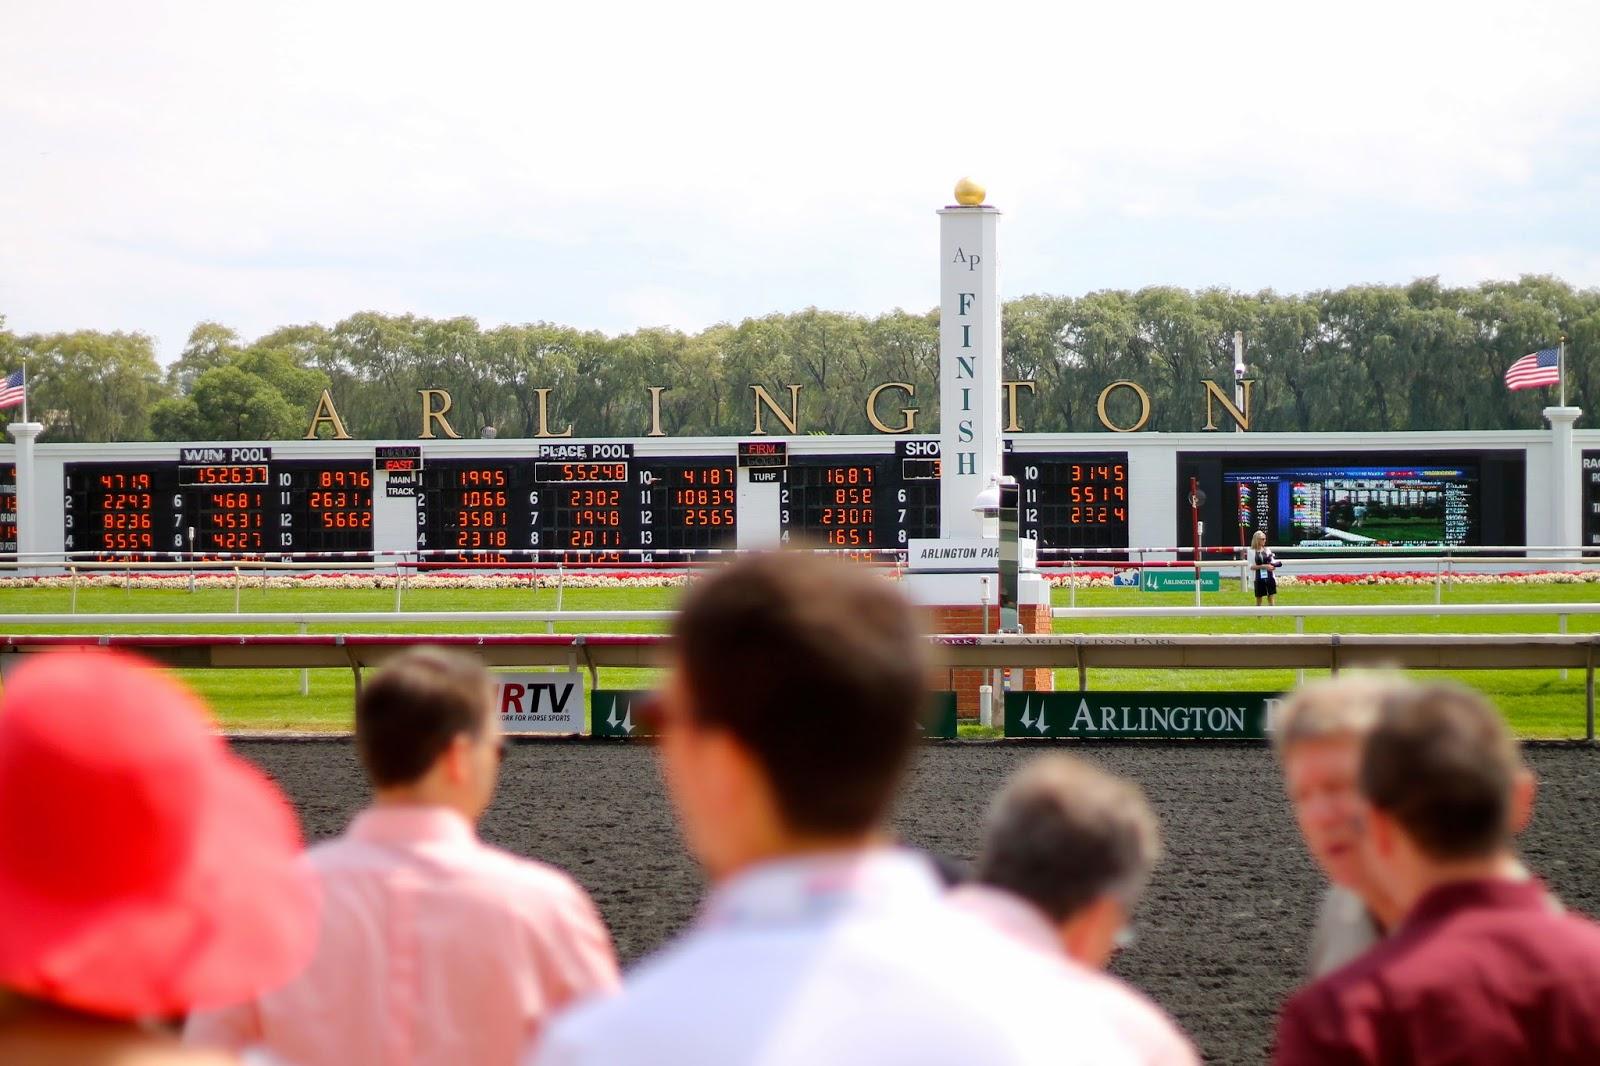 Arlington, race, track